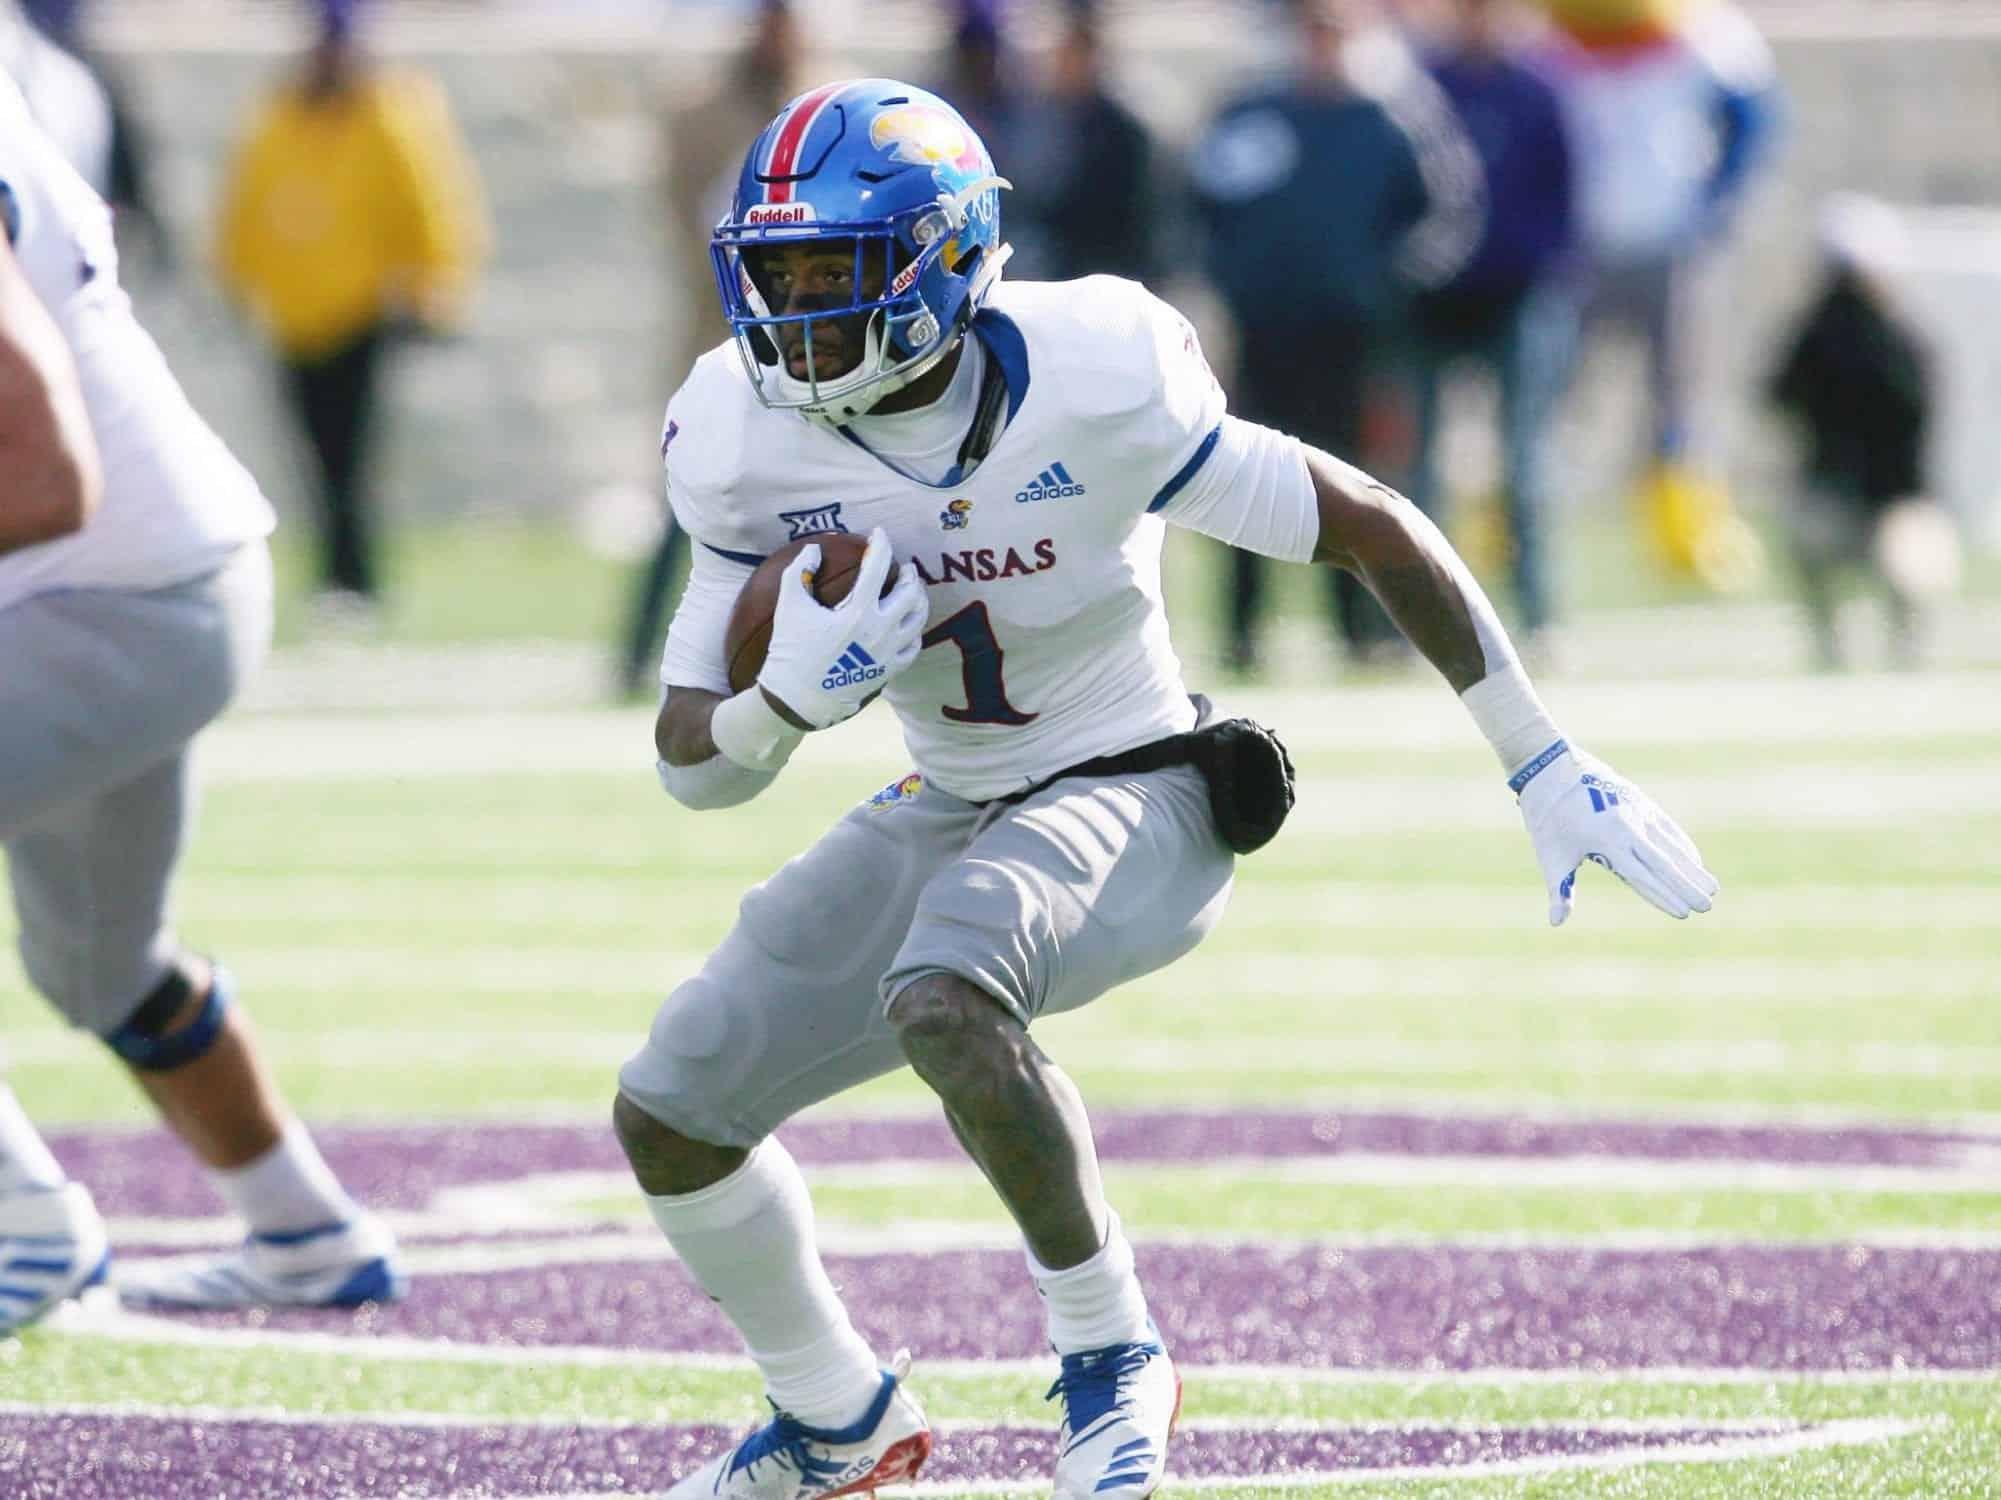 2021 NFL Draft: Kansas Running Back Pooka Williams is a top sleeper